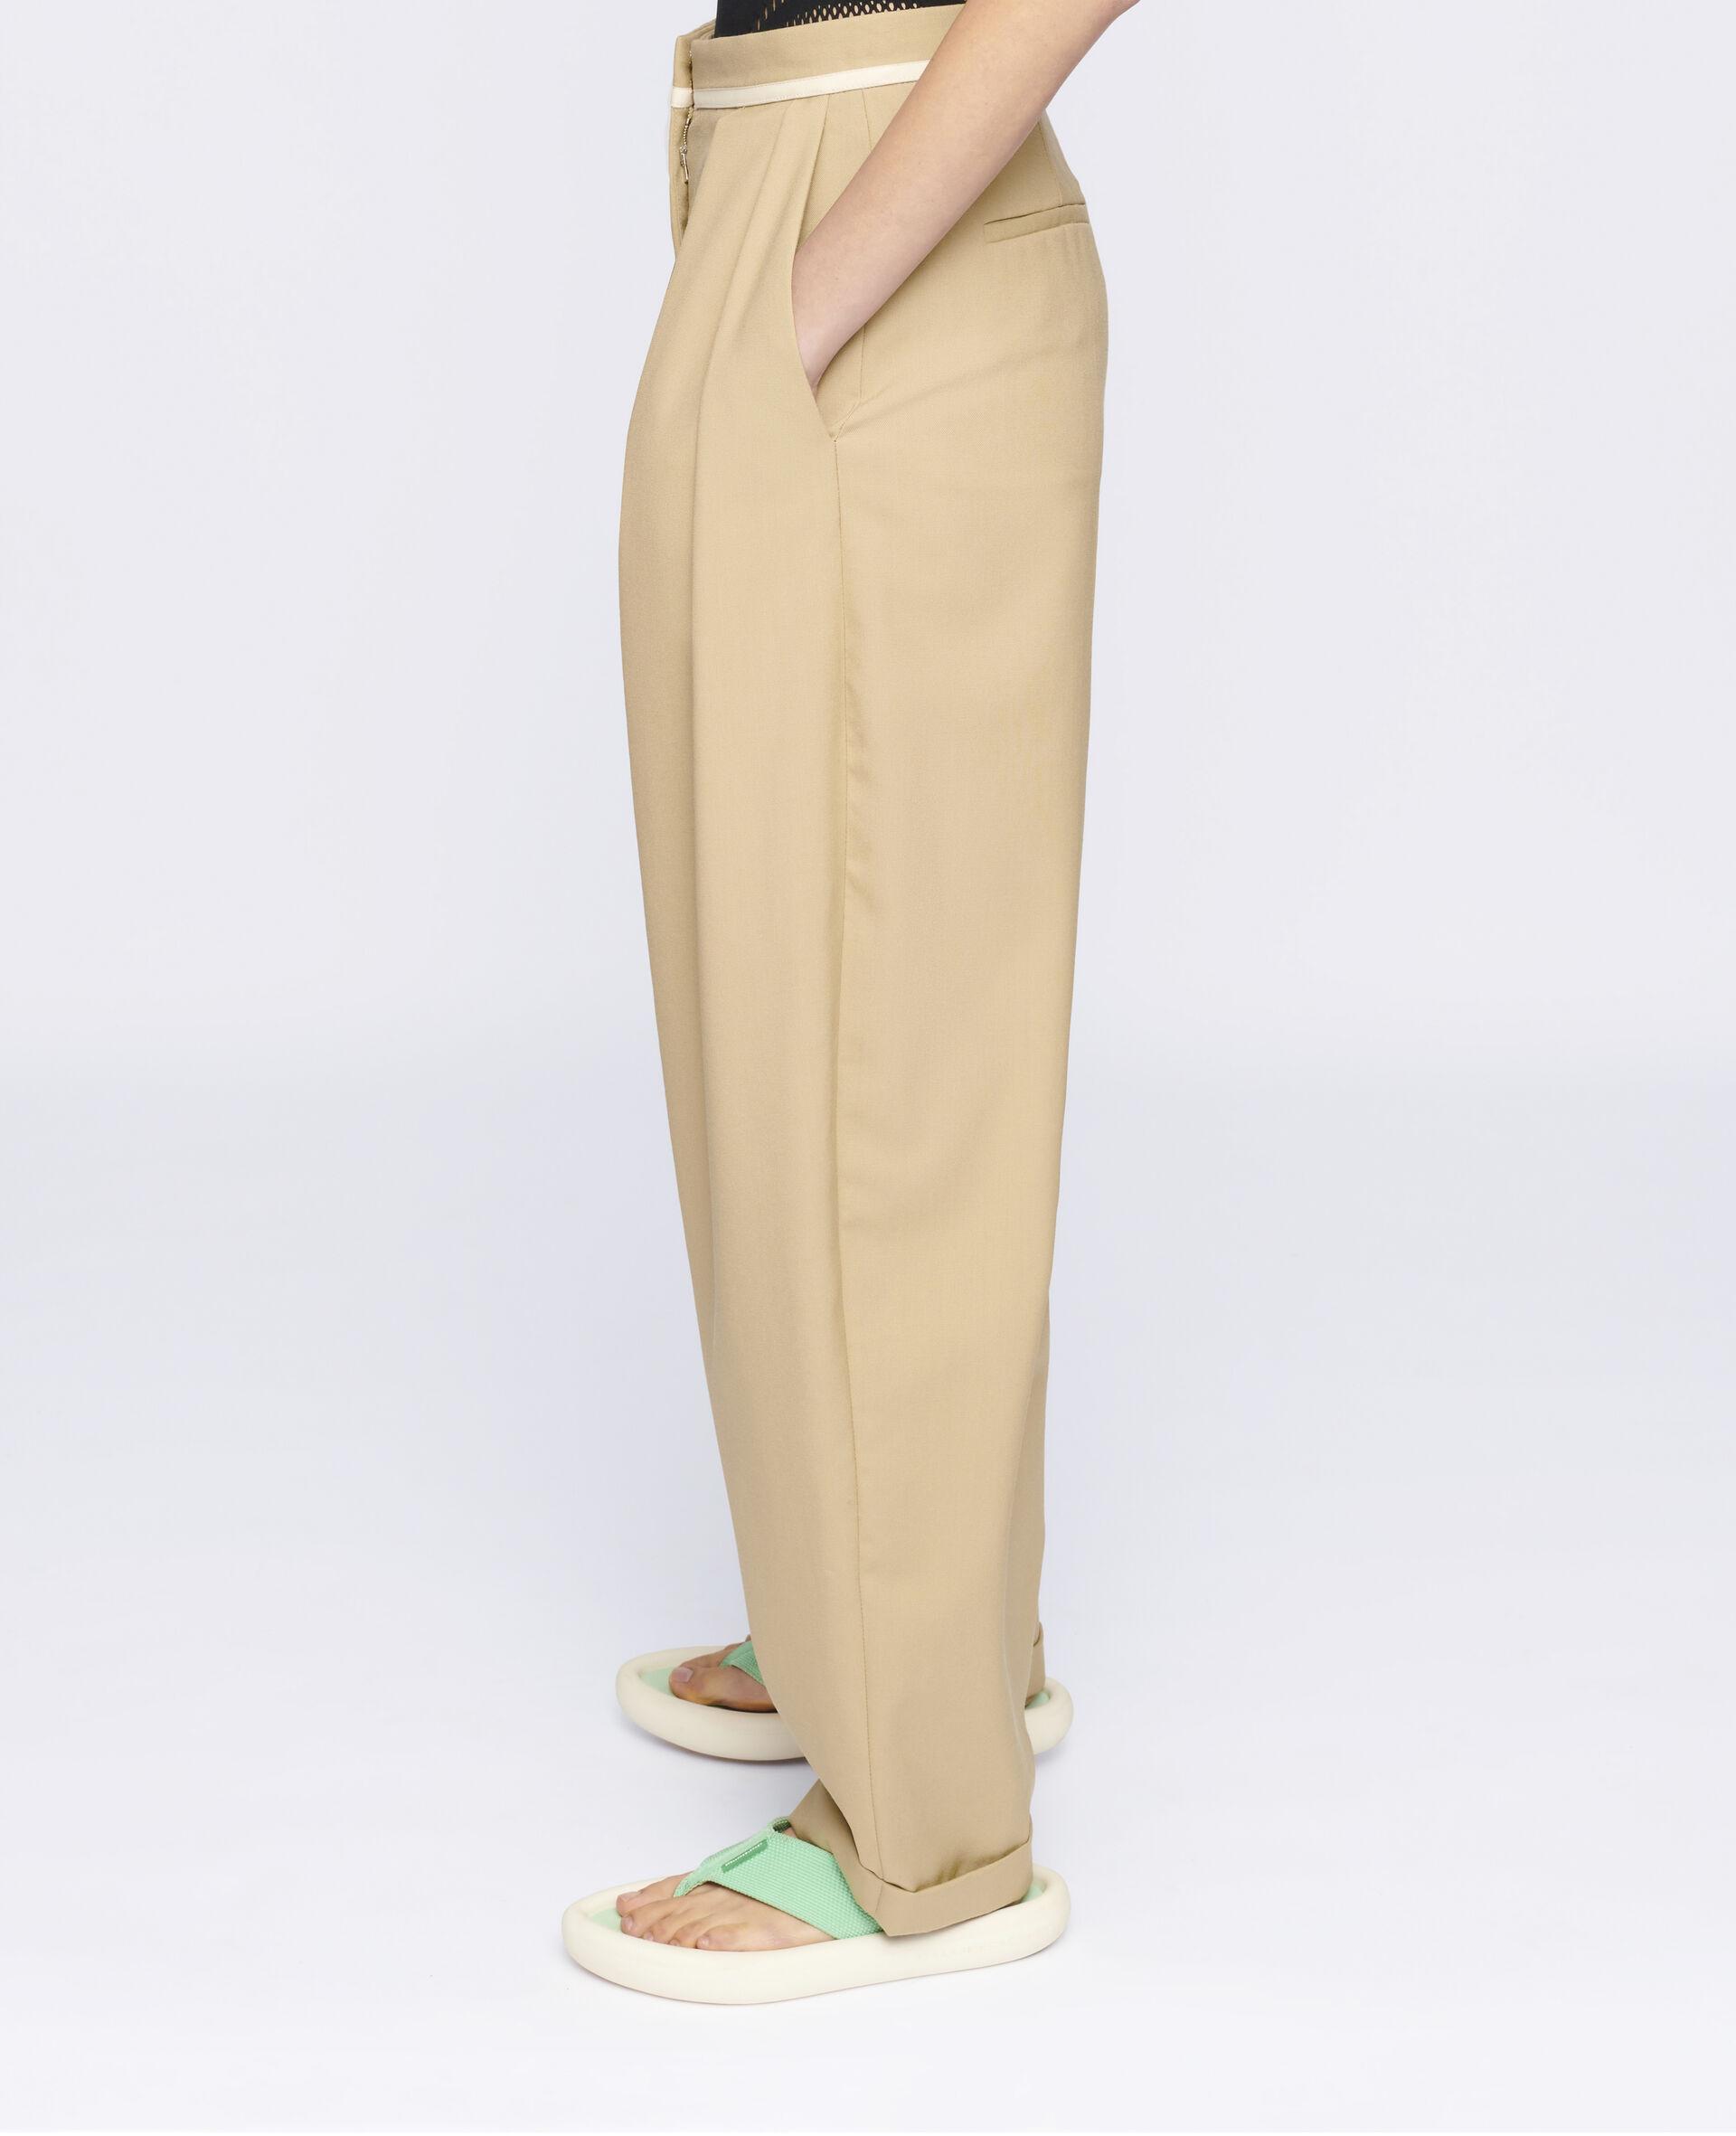 Ariana 羊毛裤装-米色-large image number 3